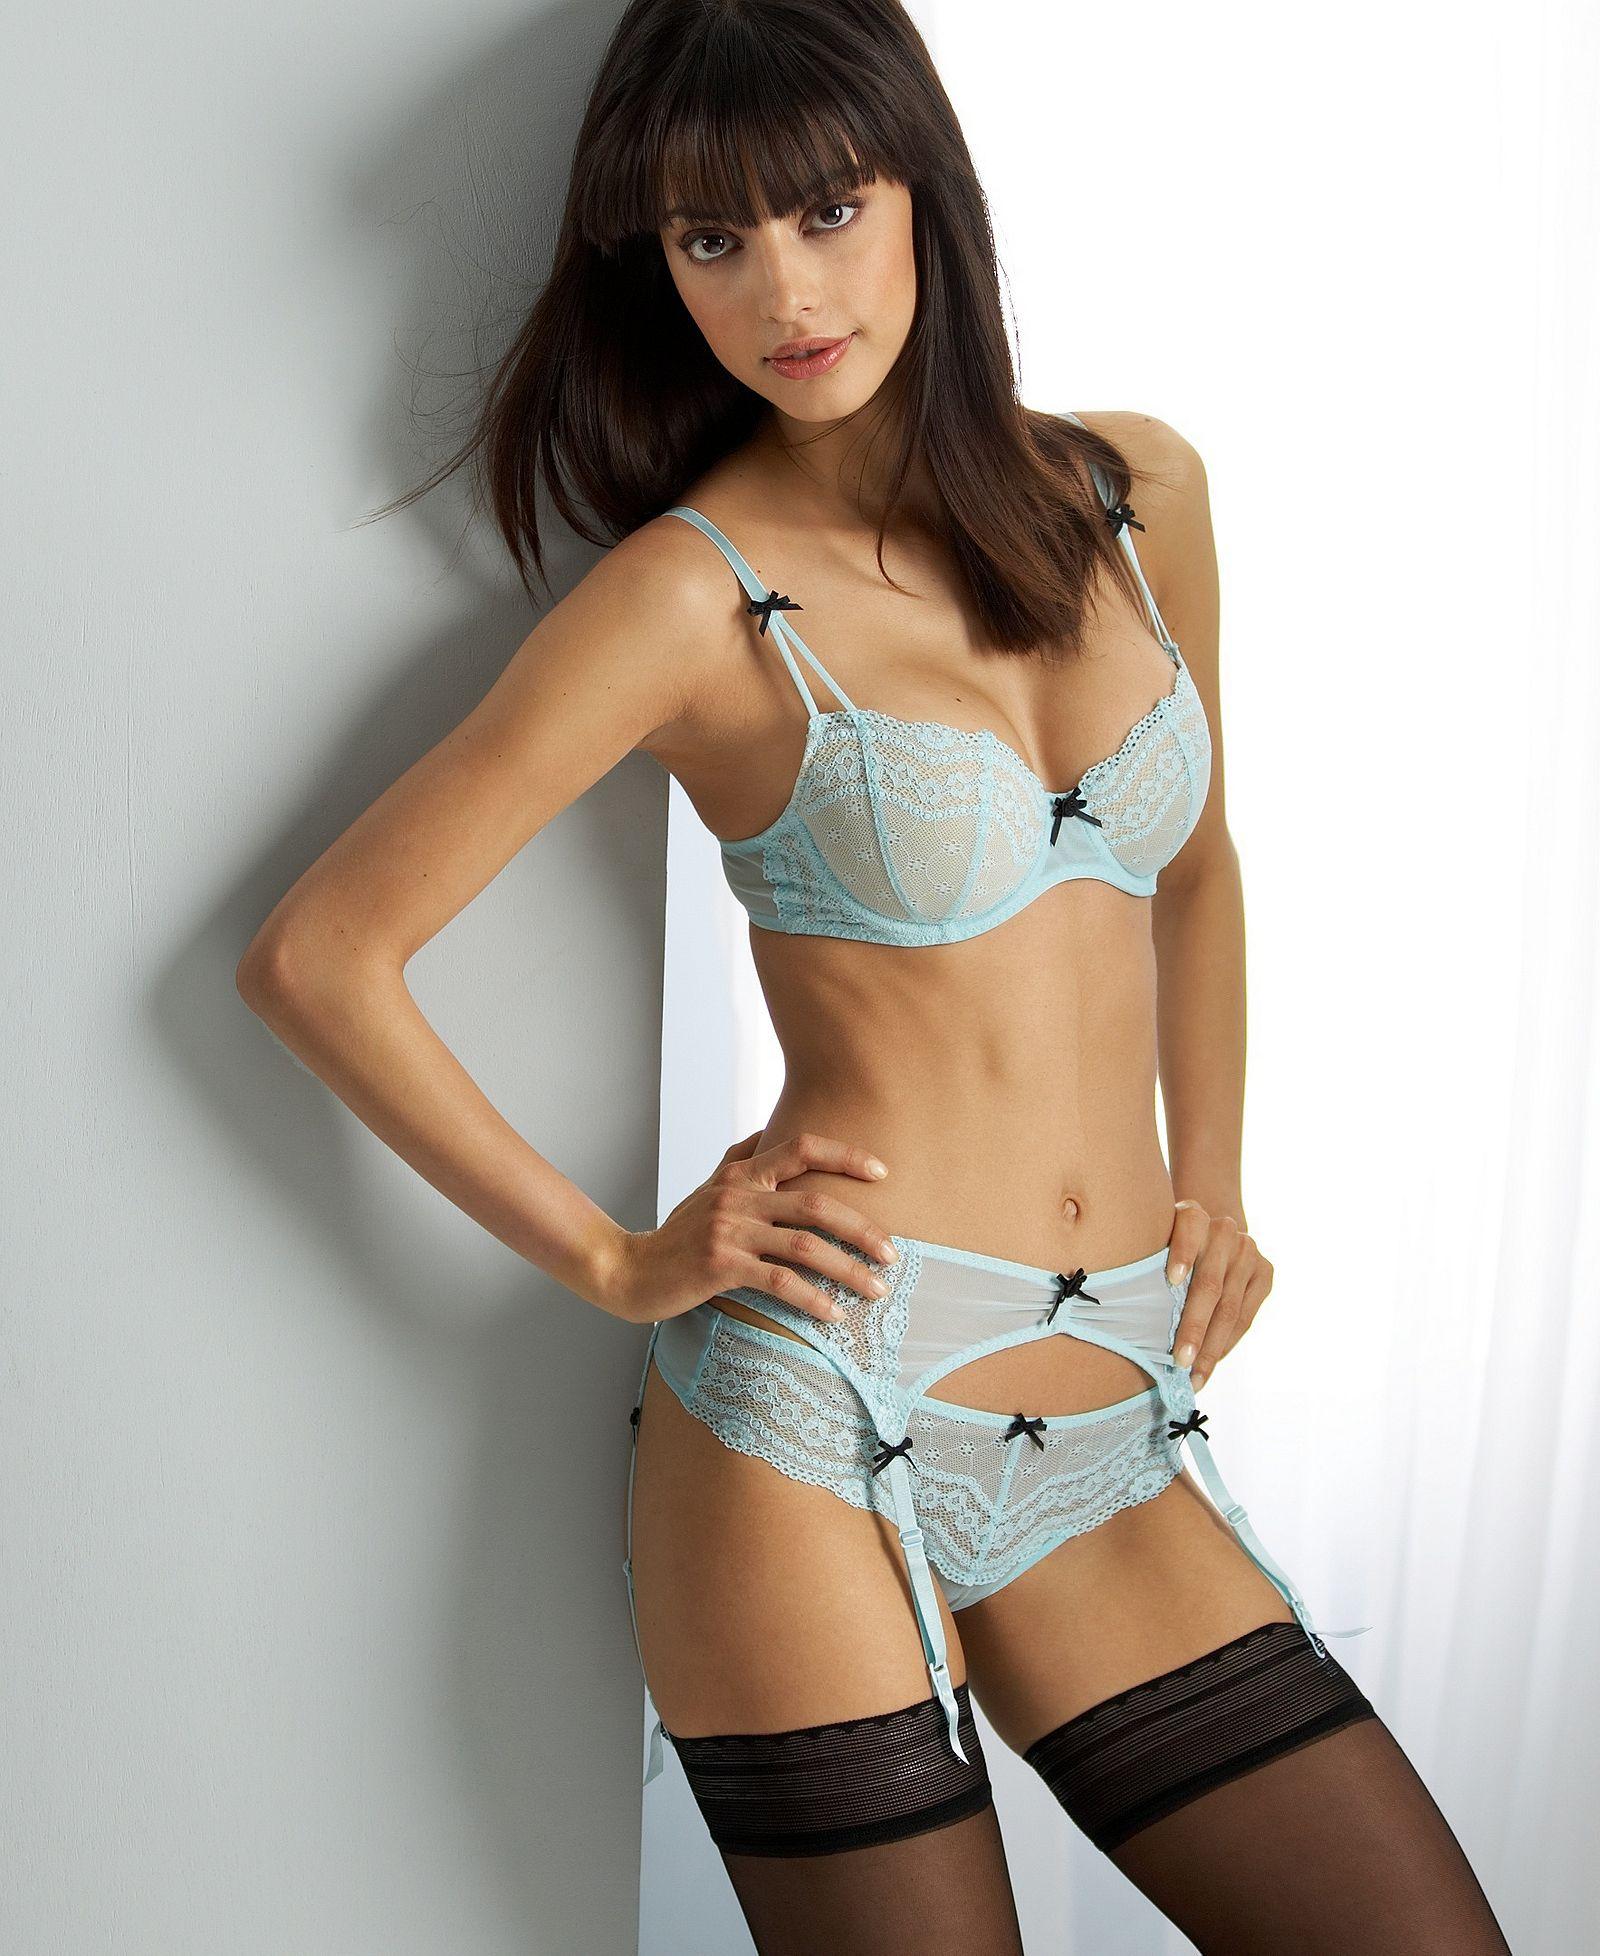 panties stockings Garter belt no